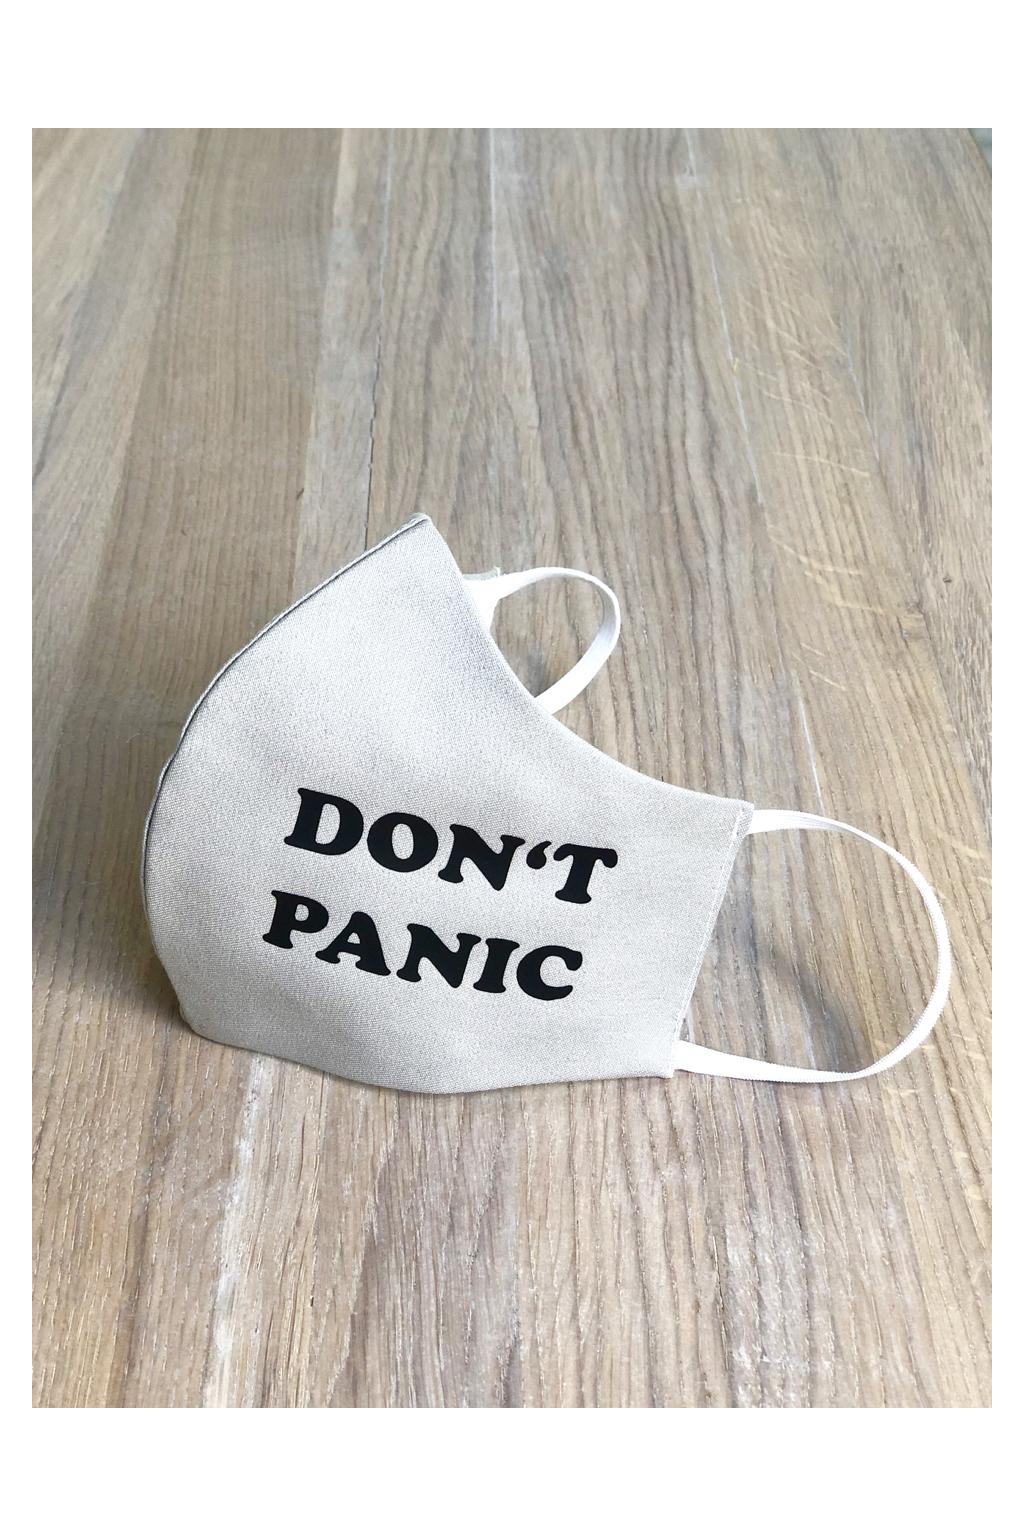 Rouška s potiskem - DON'T PANIC